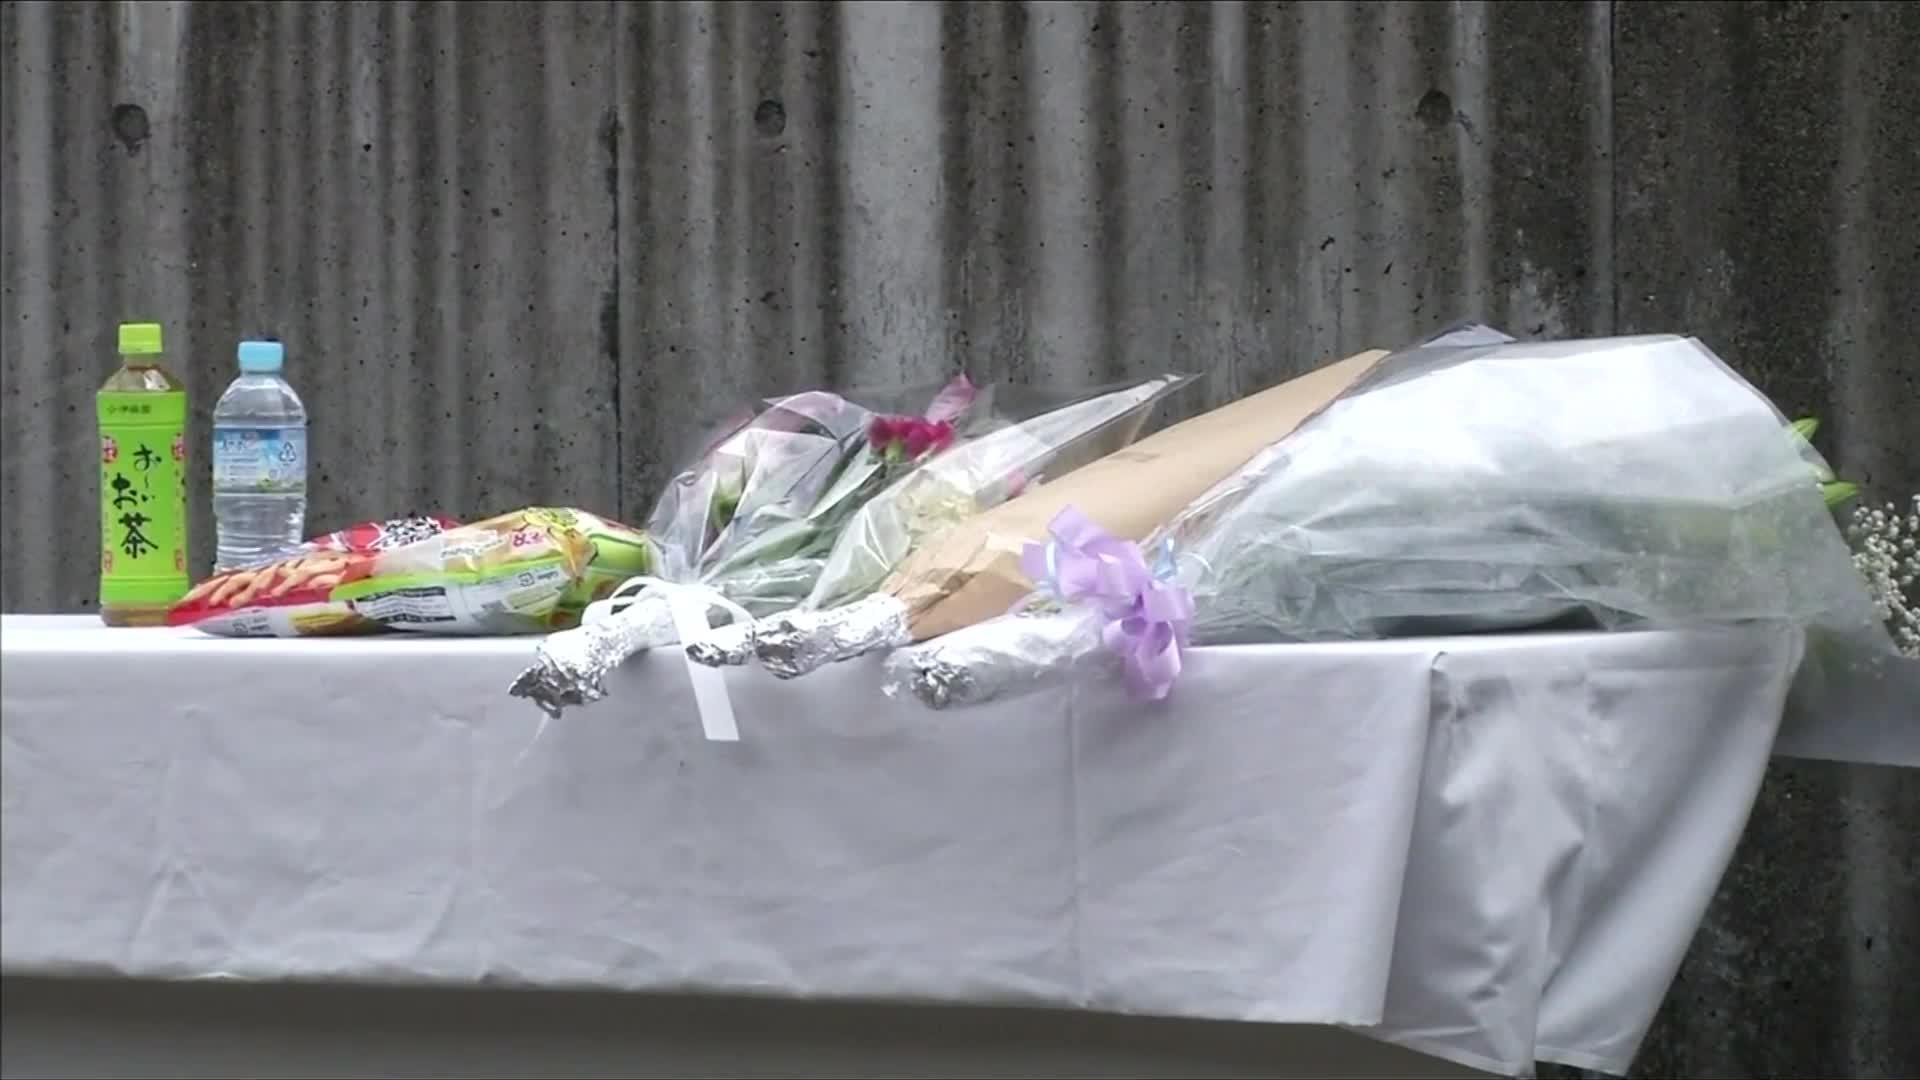 Shrine to Japan mass killing victims